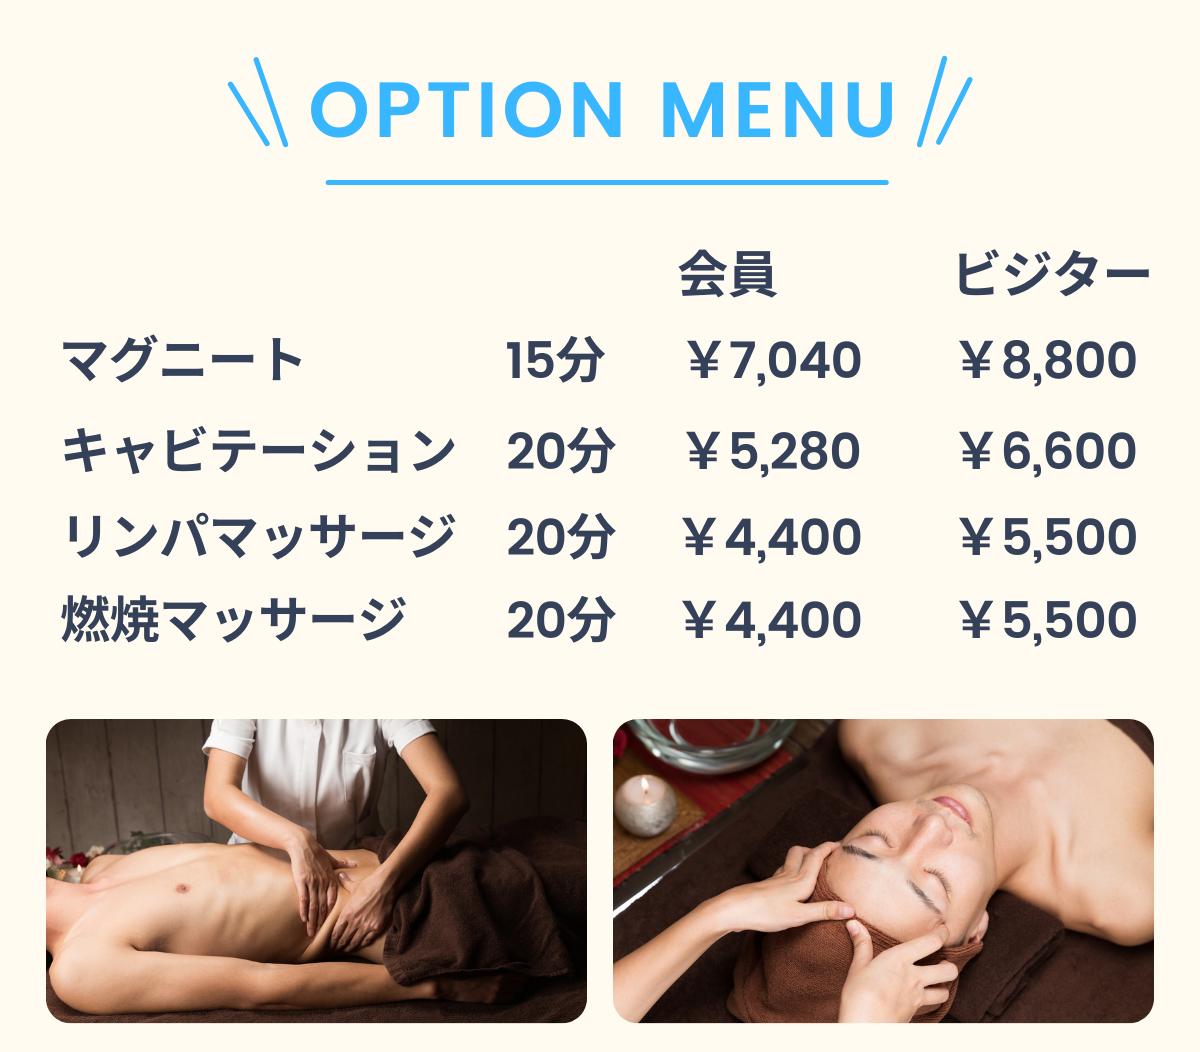 OPTION MENU!オプションメニュー!「マグニート15分 / 会員:¥7,000 ビジター:¥8,800」「キャビテーション20分 / 会員:¥5,280 ビジター:¥6,600」「リンパマッサージ20分 / 会員:¥4,400 ビジター:¥5,500」「燃焼マッサージ20分 / 会員:¥4,400 ビジター:¥5,500」